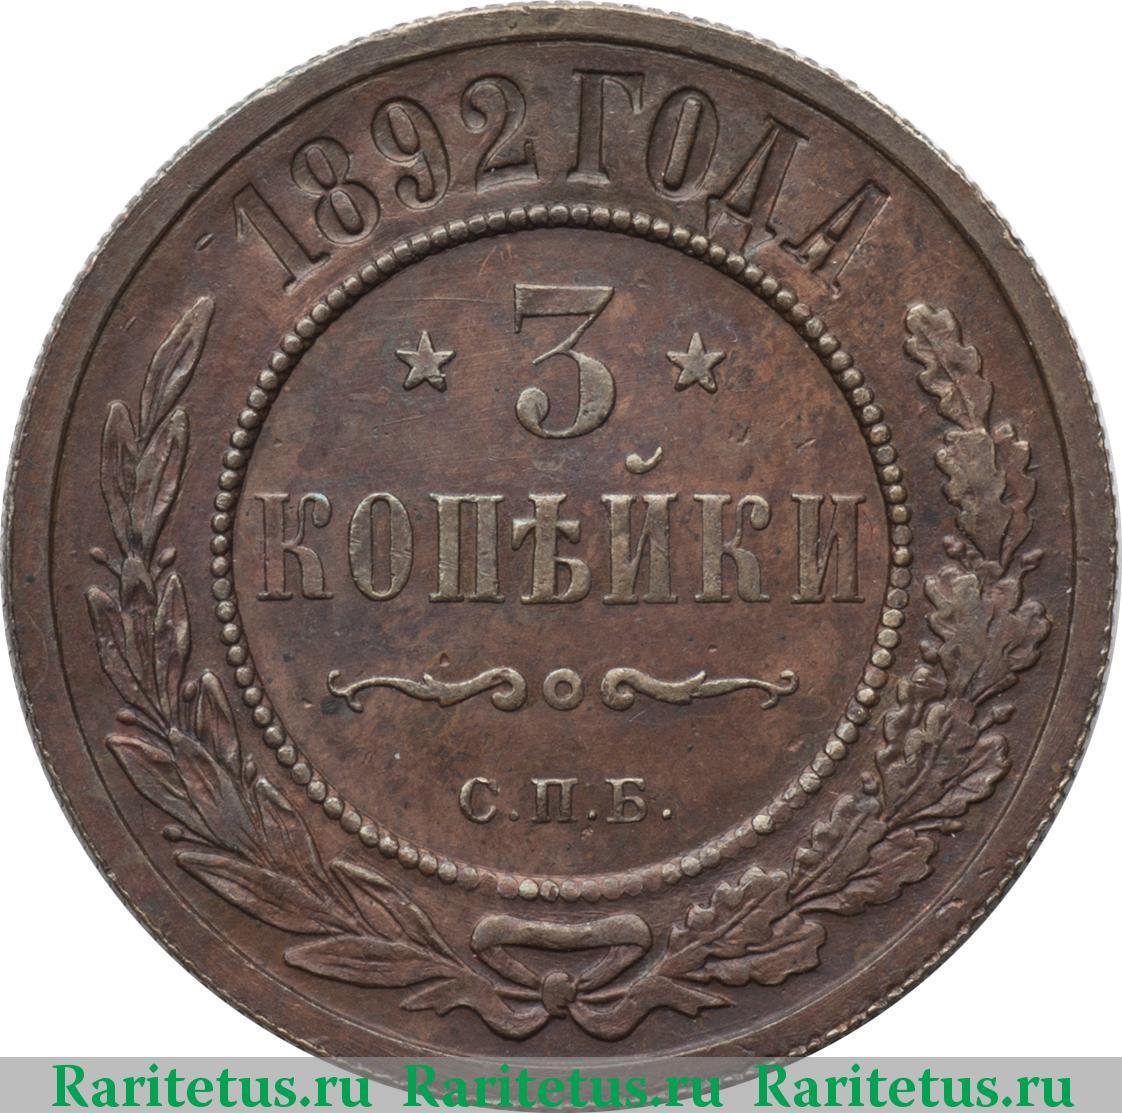 25000 рублей 1923 года цена